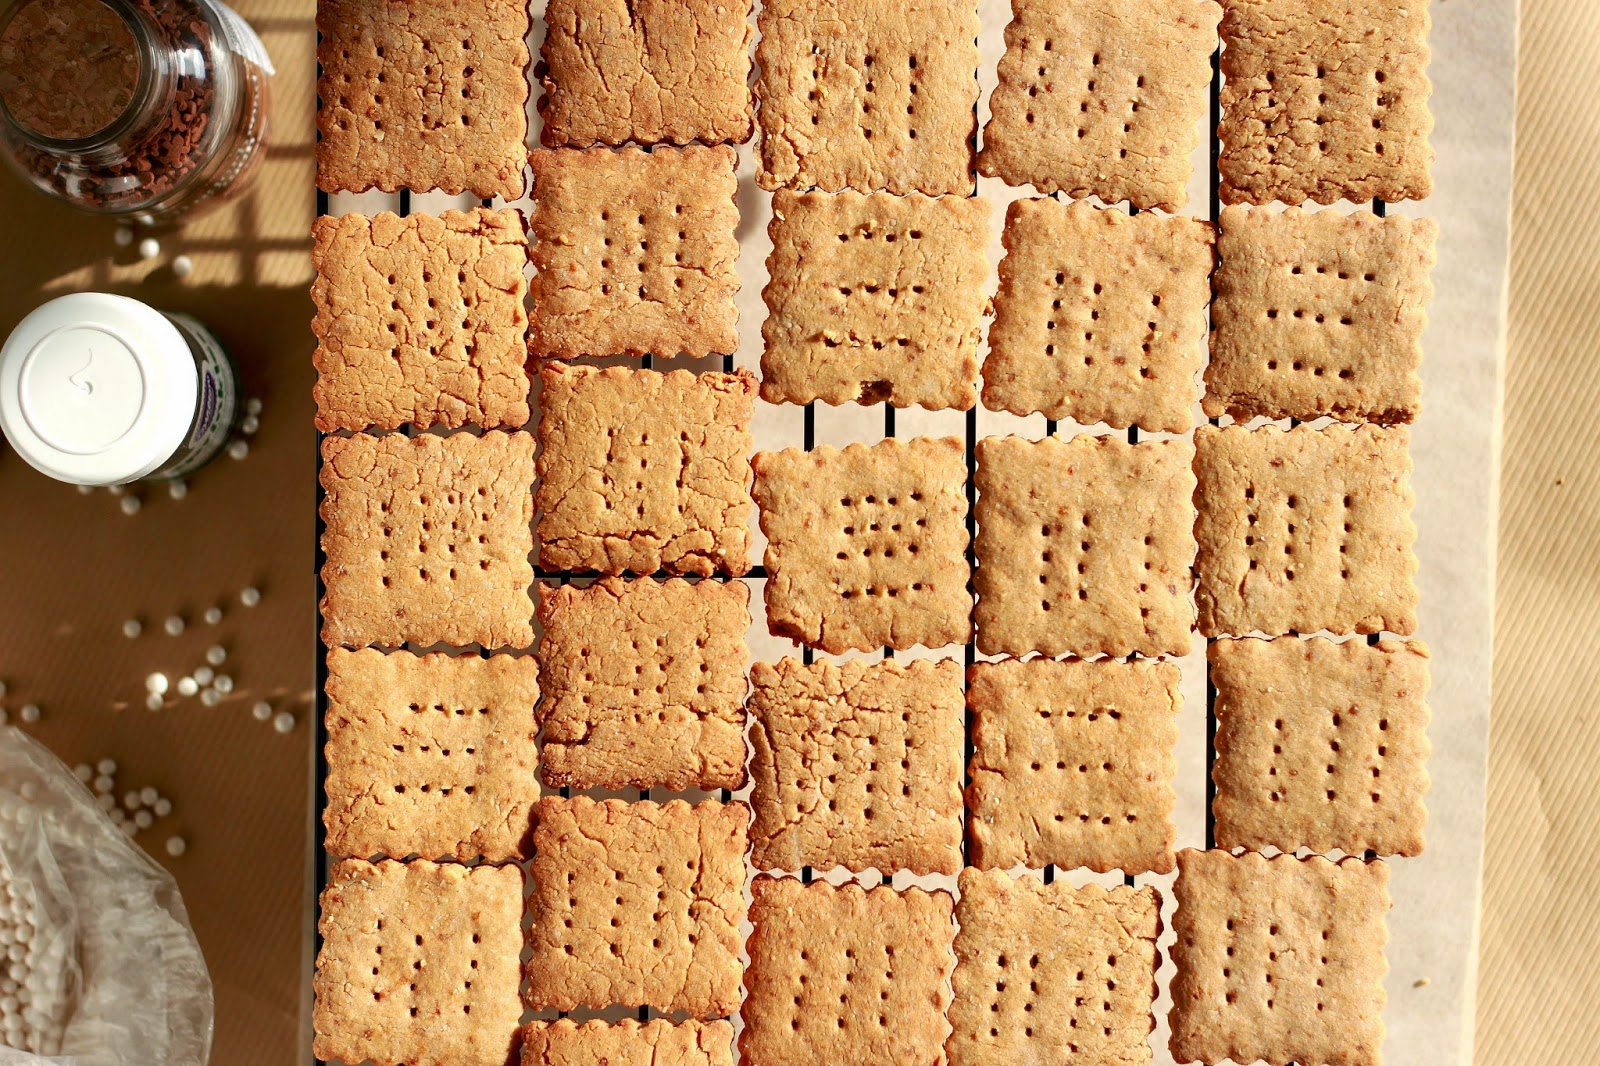 Feeding My Addiction: World's Healthiest Shortbread Cookies